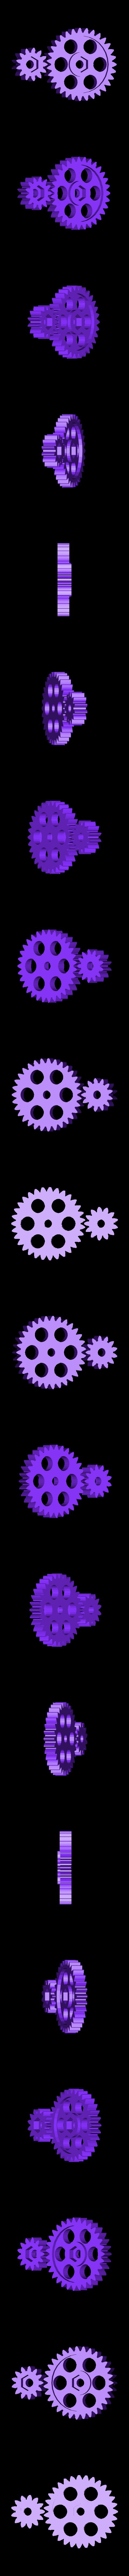 HPTO_gear_reduction.stl Download free STL file HuPo Take-Off • Design to 3D print, Azagal